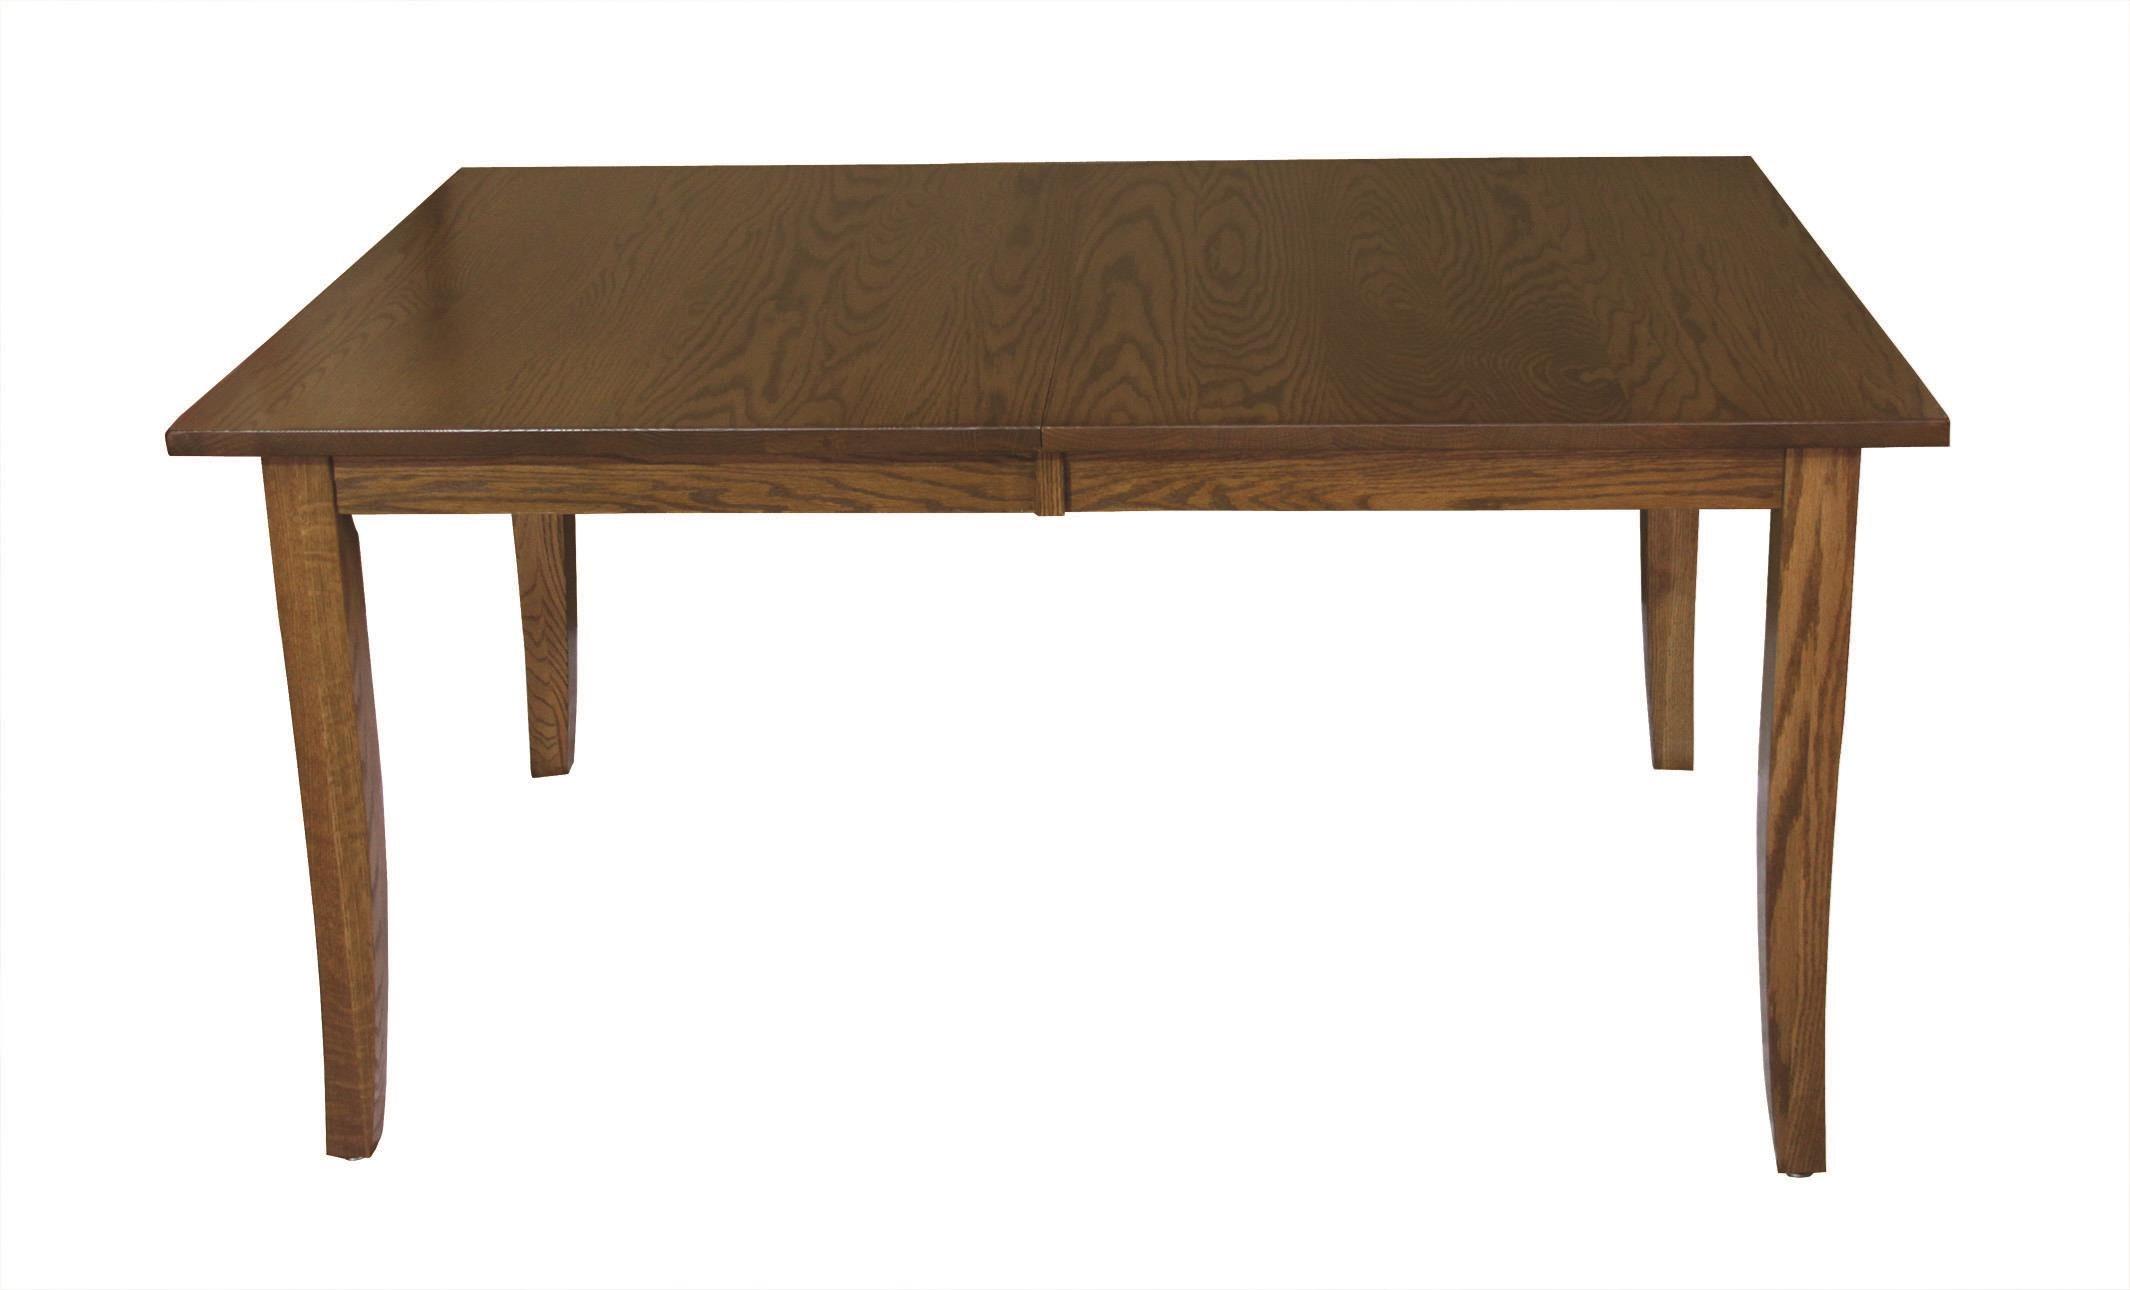 Kountry Knob Curved Shaker Leg Table by Wayside Custom Furniture at Wayside Furniture